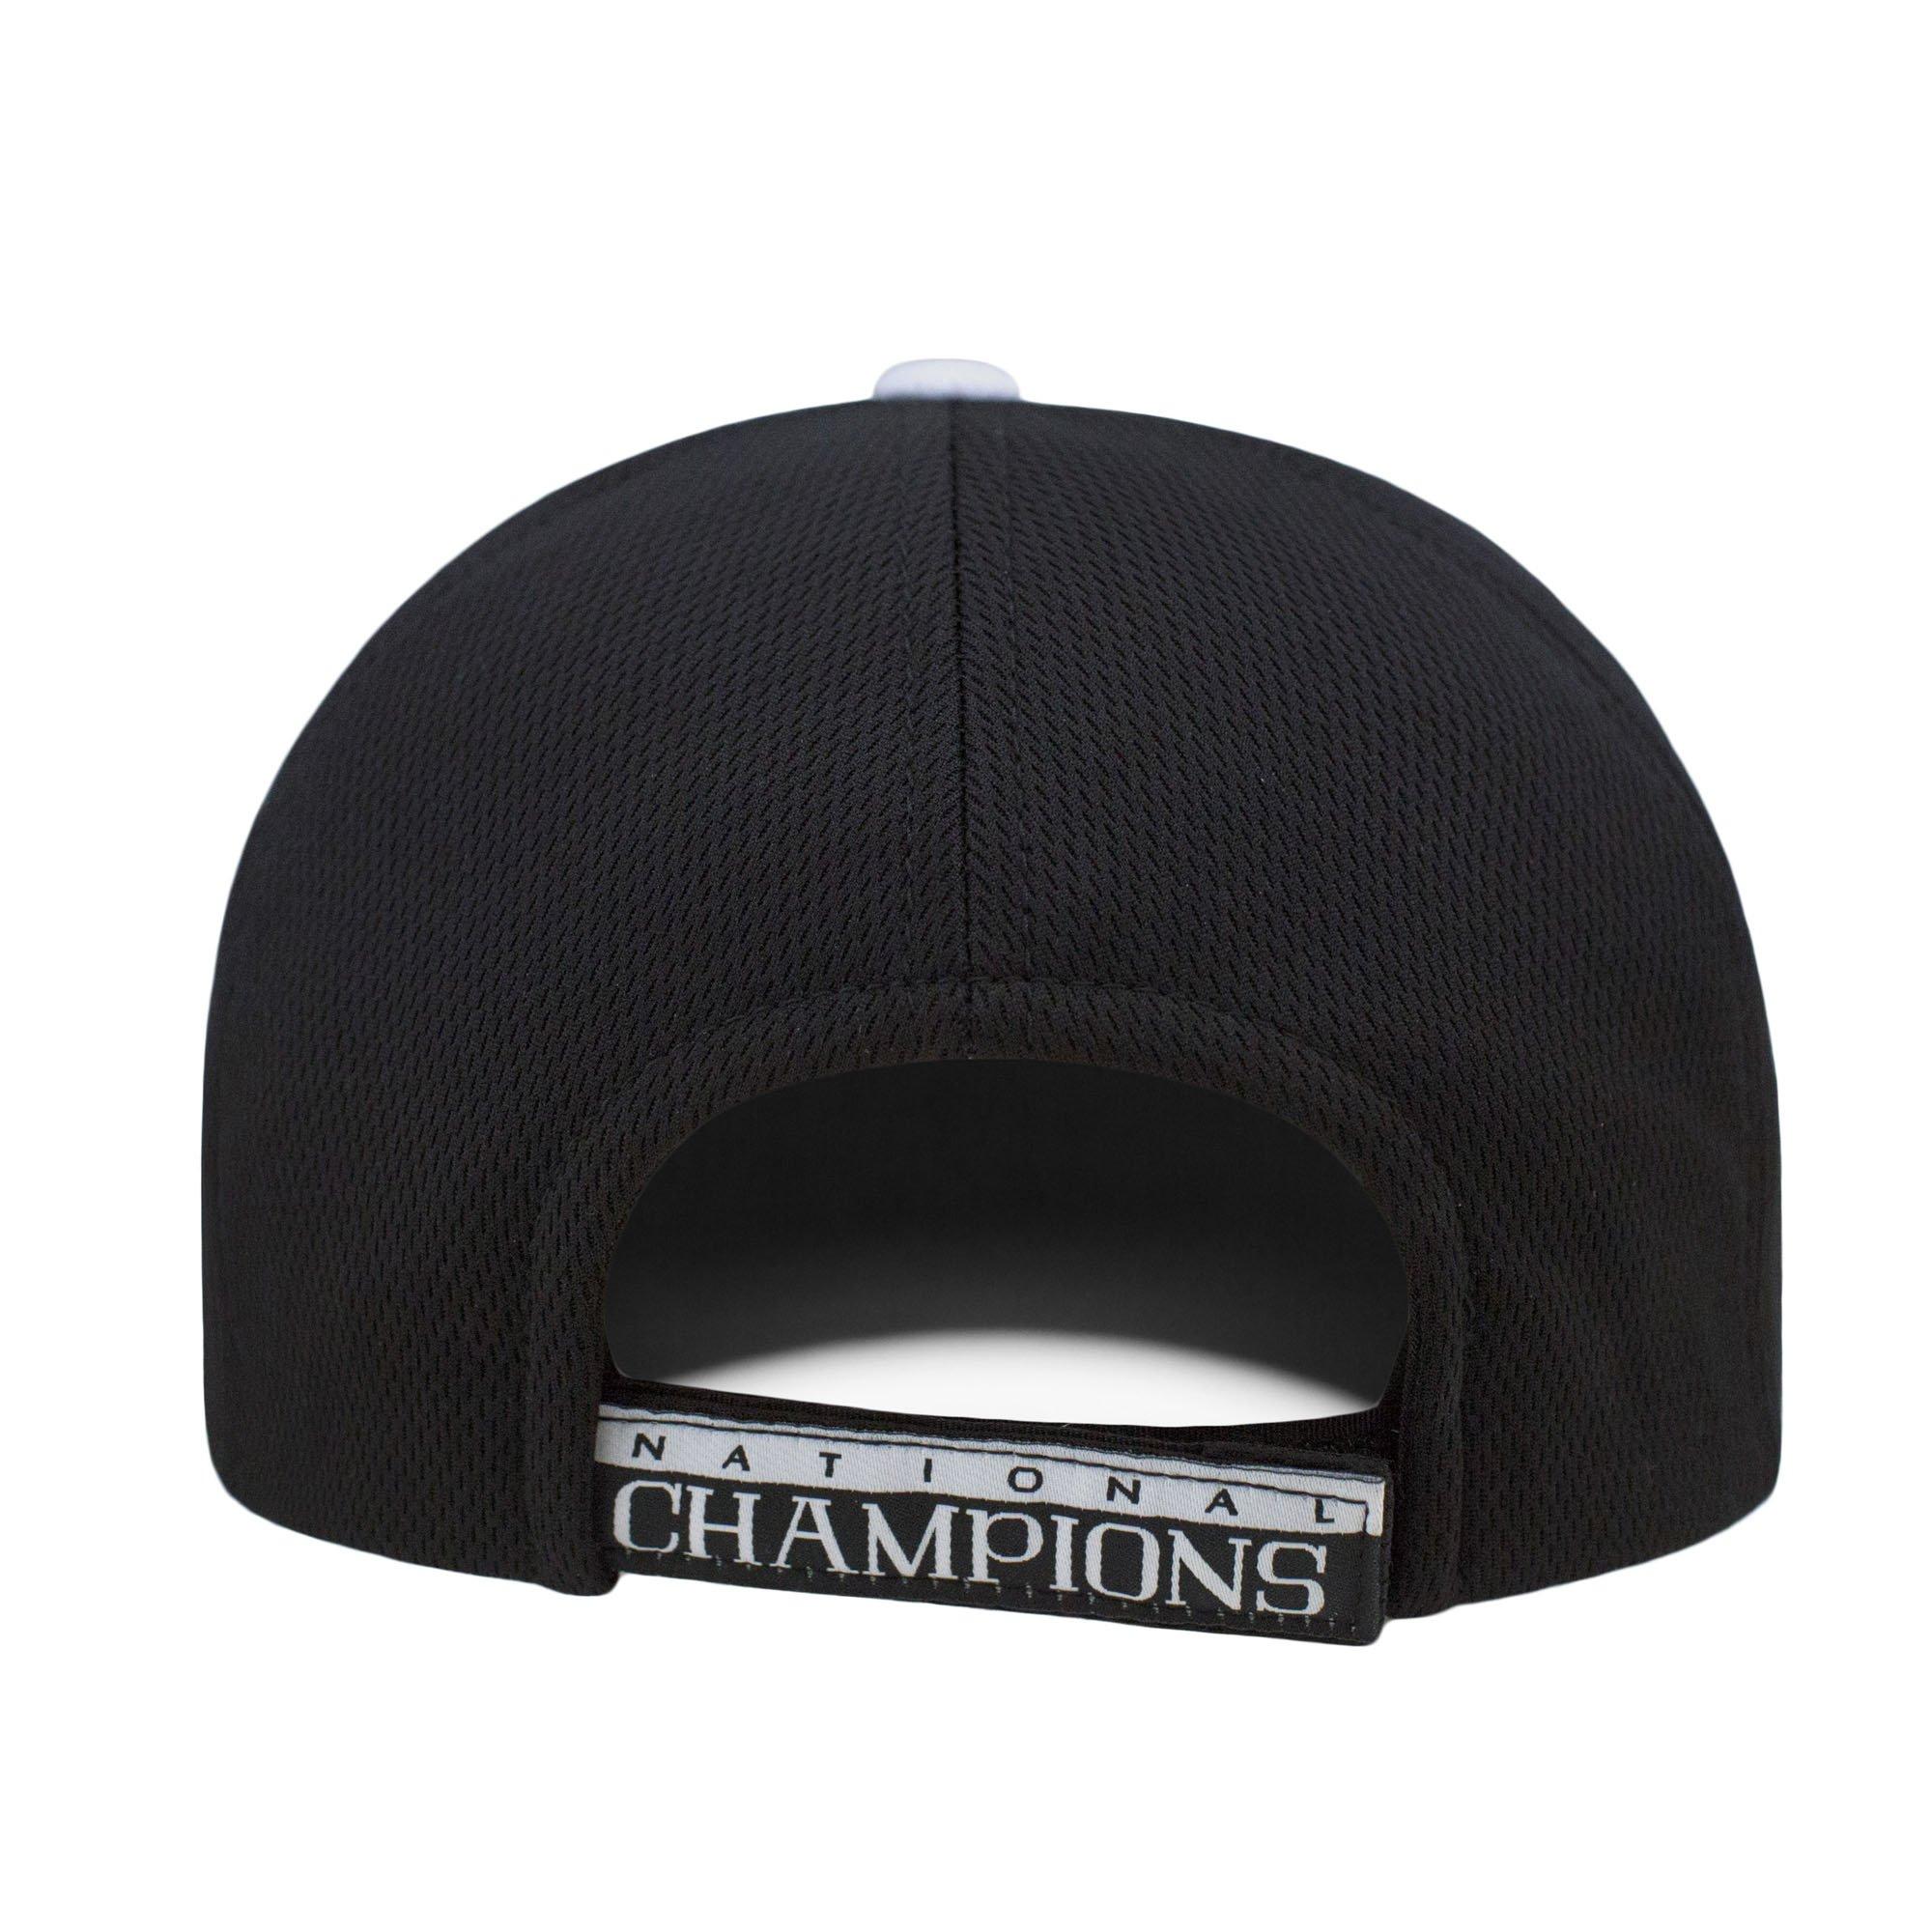 Top of the World Denver Pioneers 2015 LAX Lacrosse Champions Locker Room Adjust Black Hat Cap